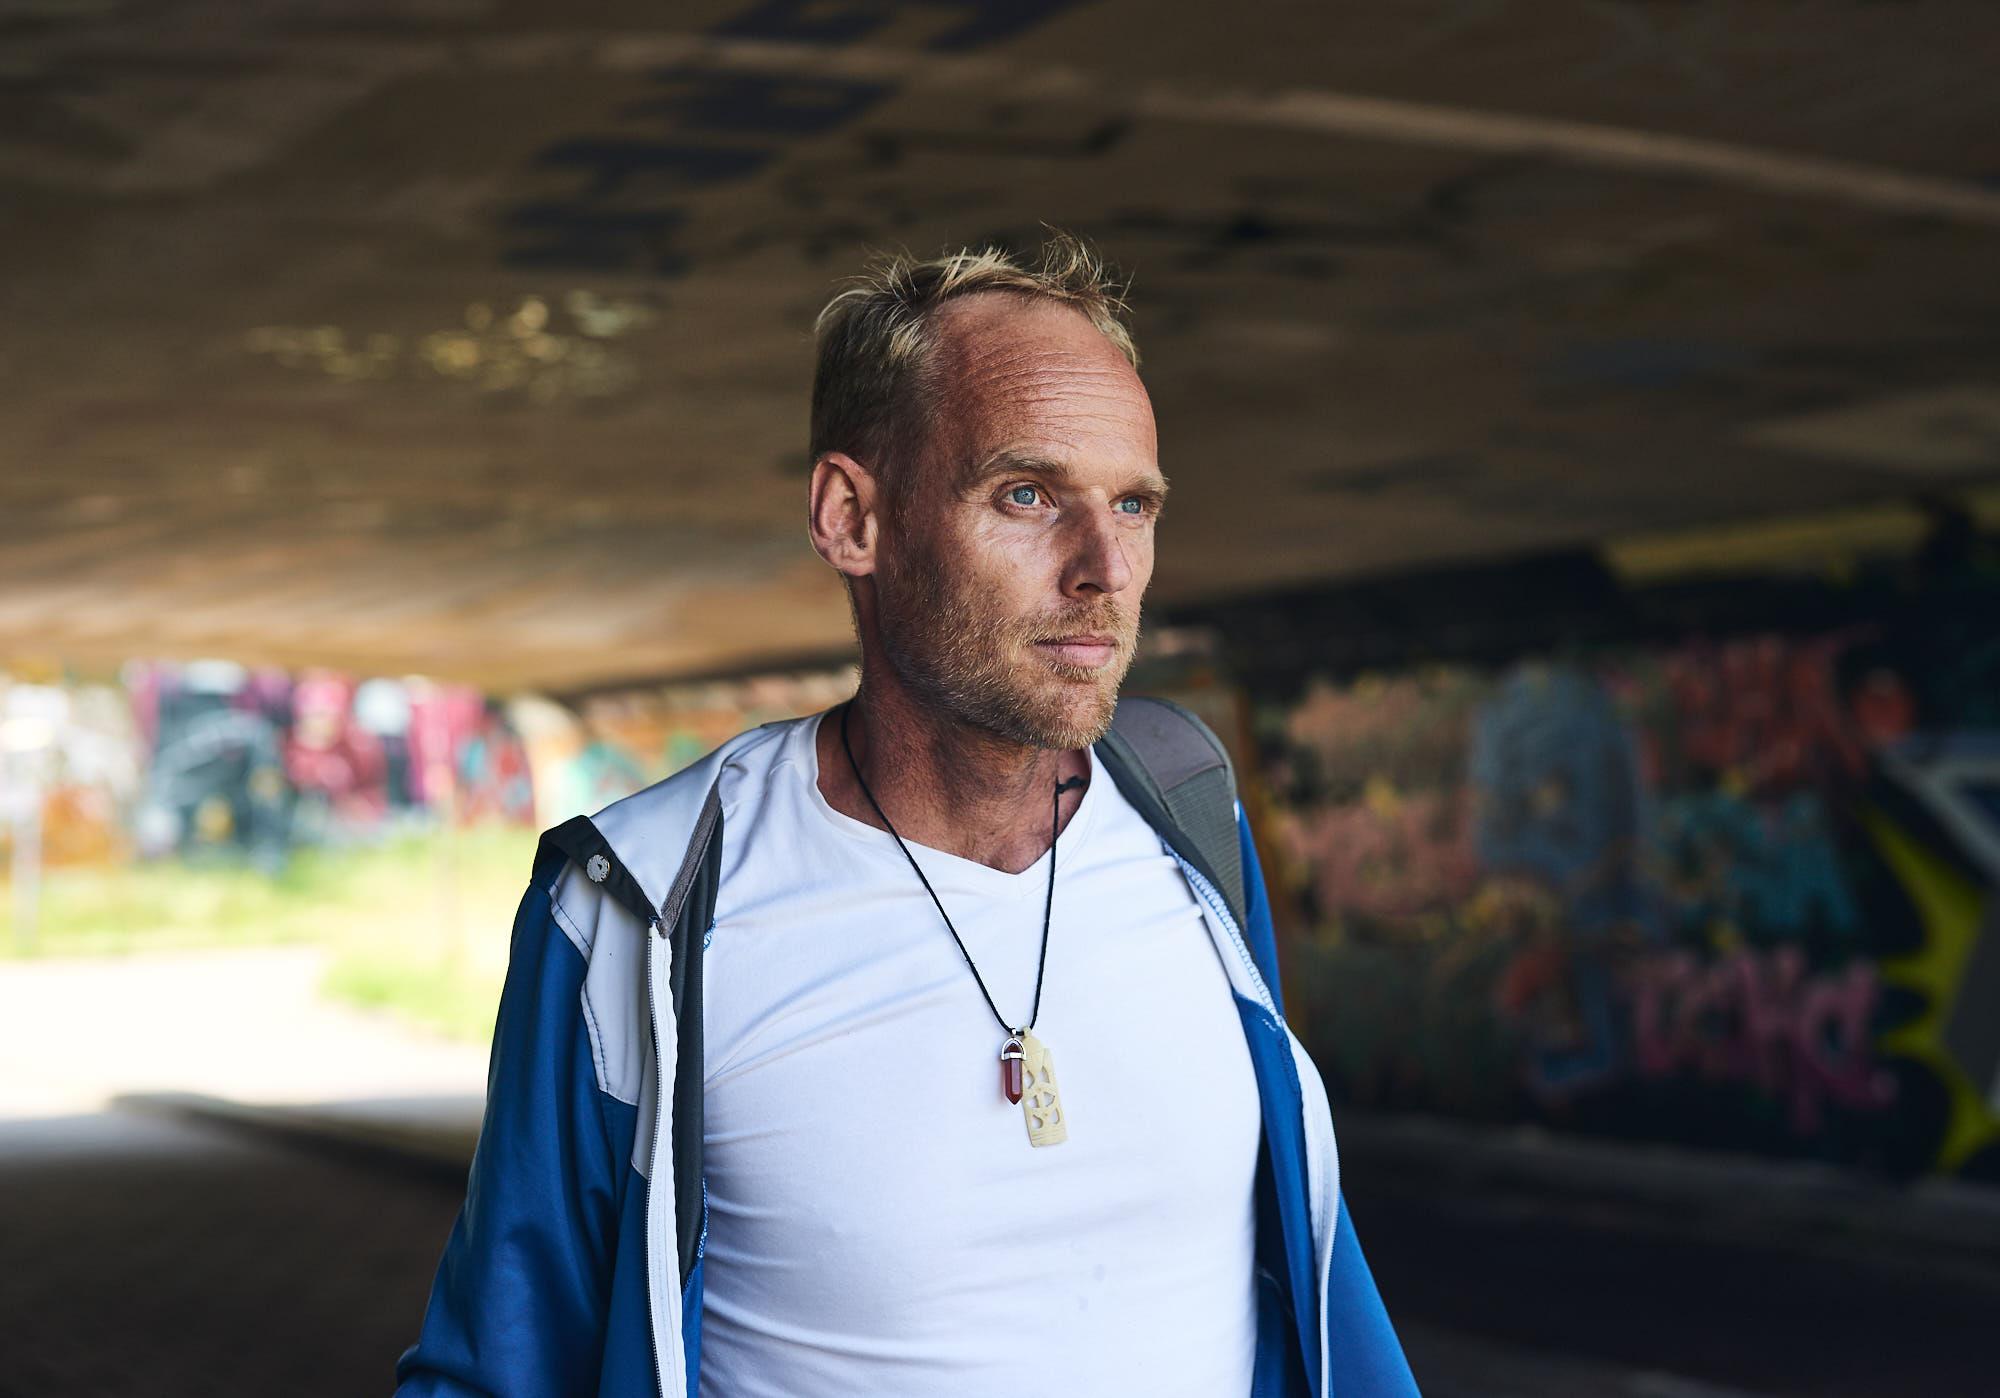 Portrait of graffiti artist Emil van der Wijst